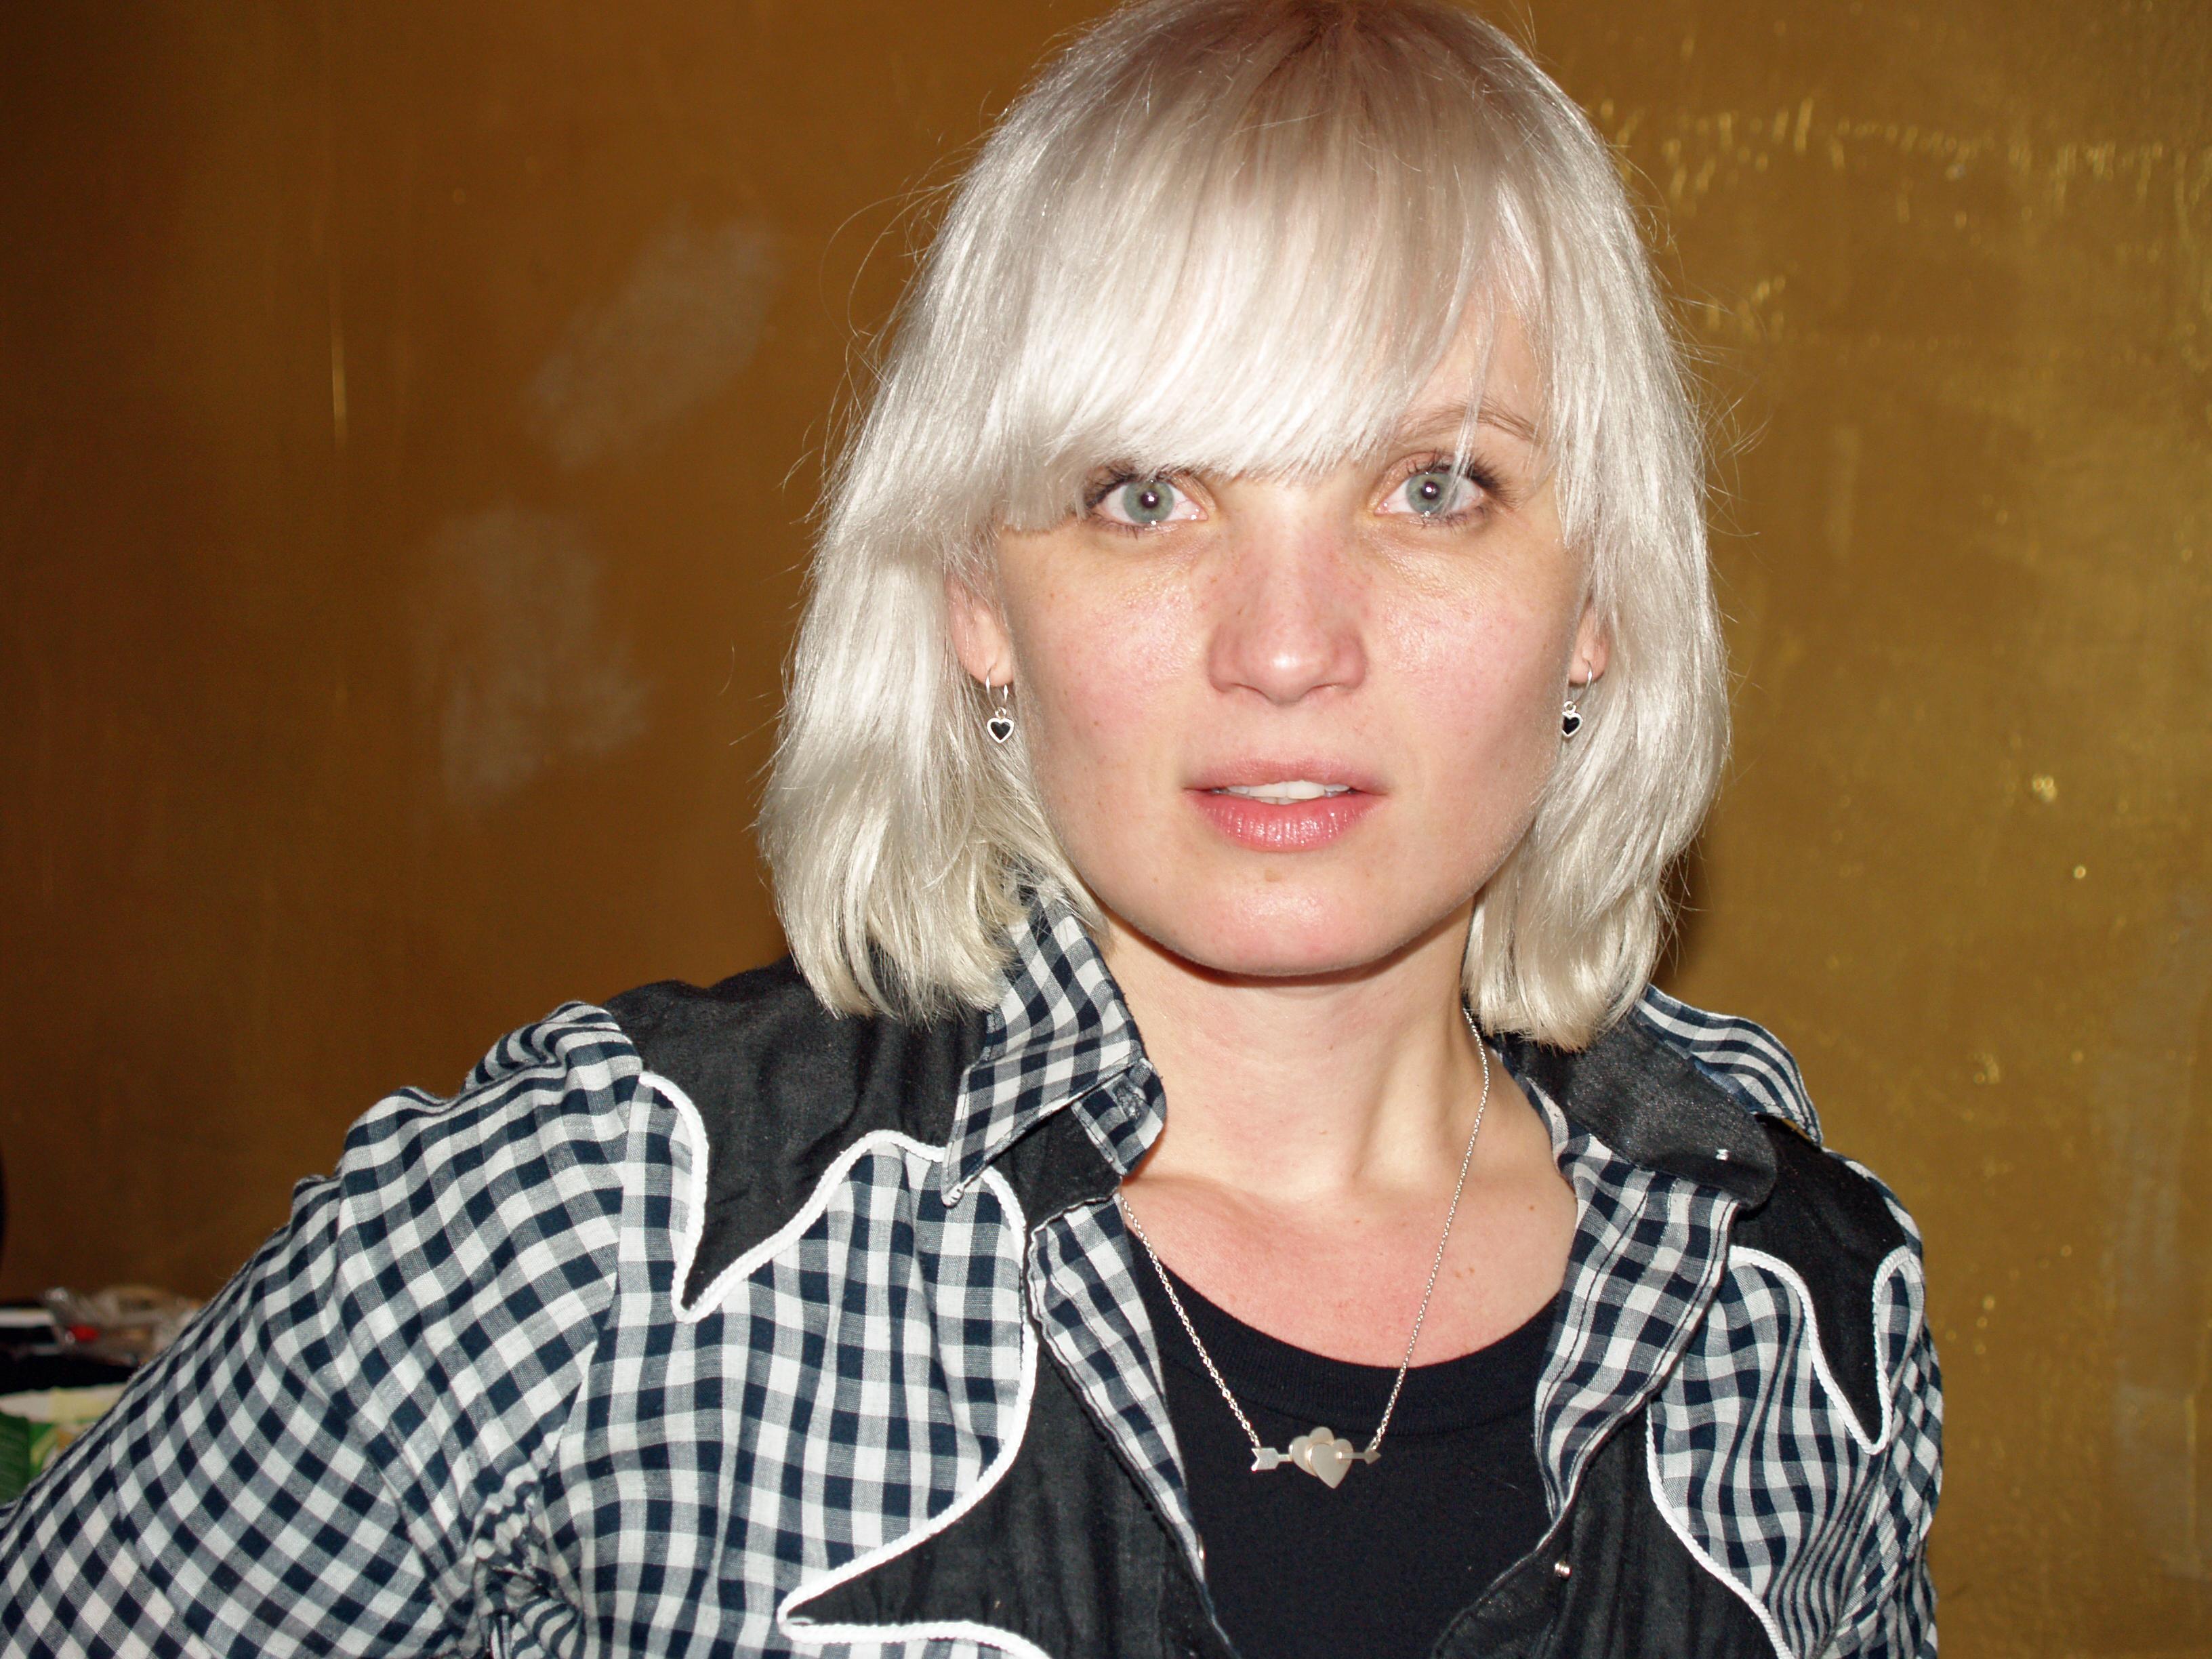 Lotte Anker* Anker·/ Marilyn Crispell* Crispell·/ Marilyn Mazur* Mazur - Poetic Justice